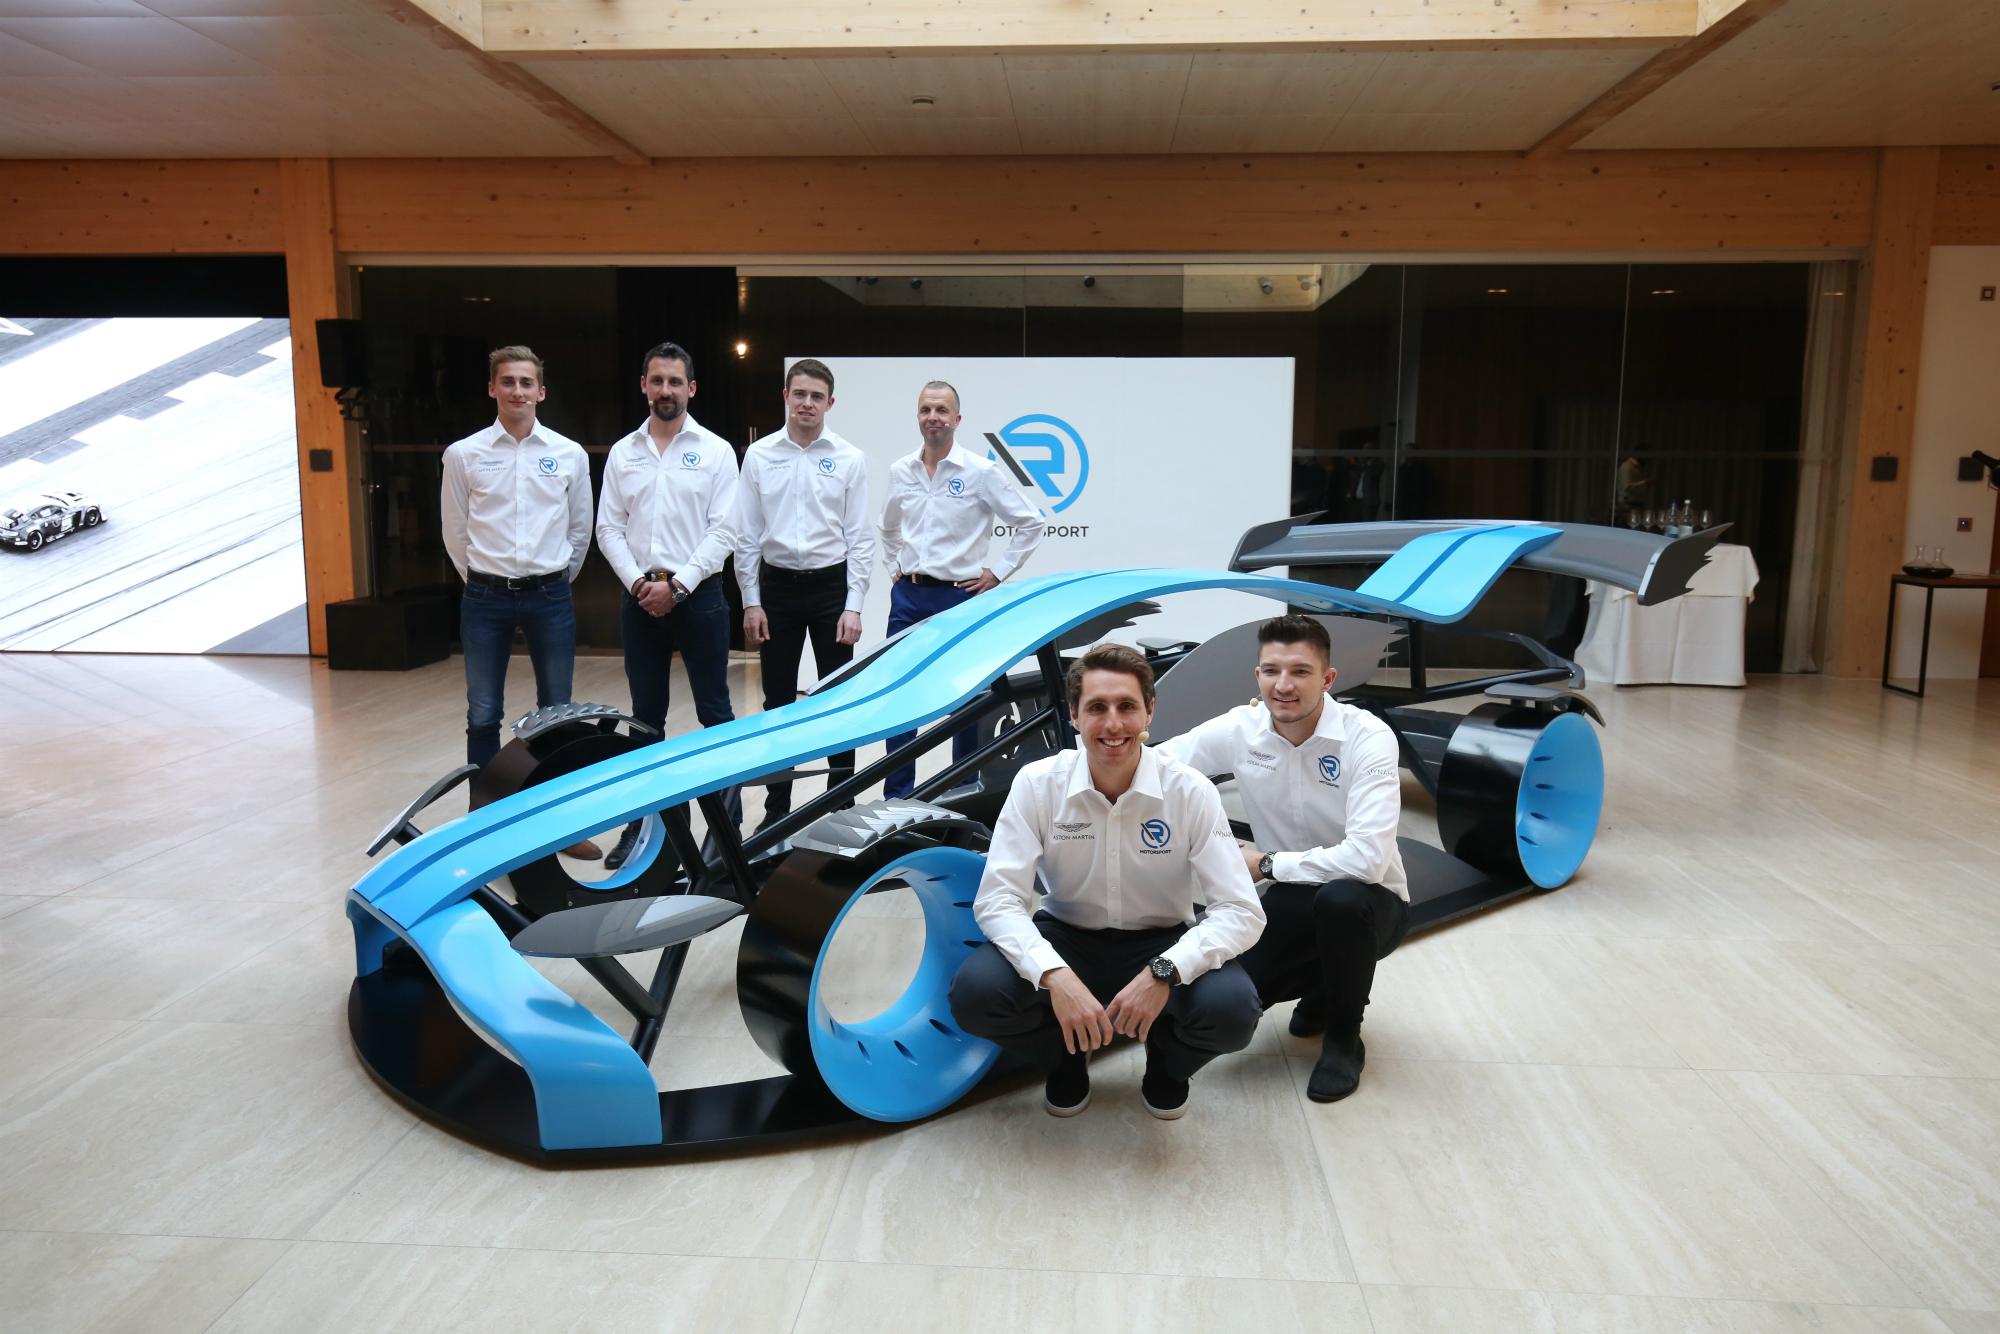 DTM, R Motorsport, DTM 2019, Aston Martin,